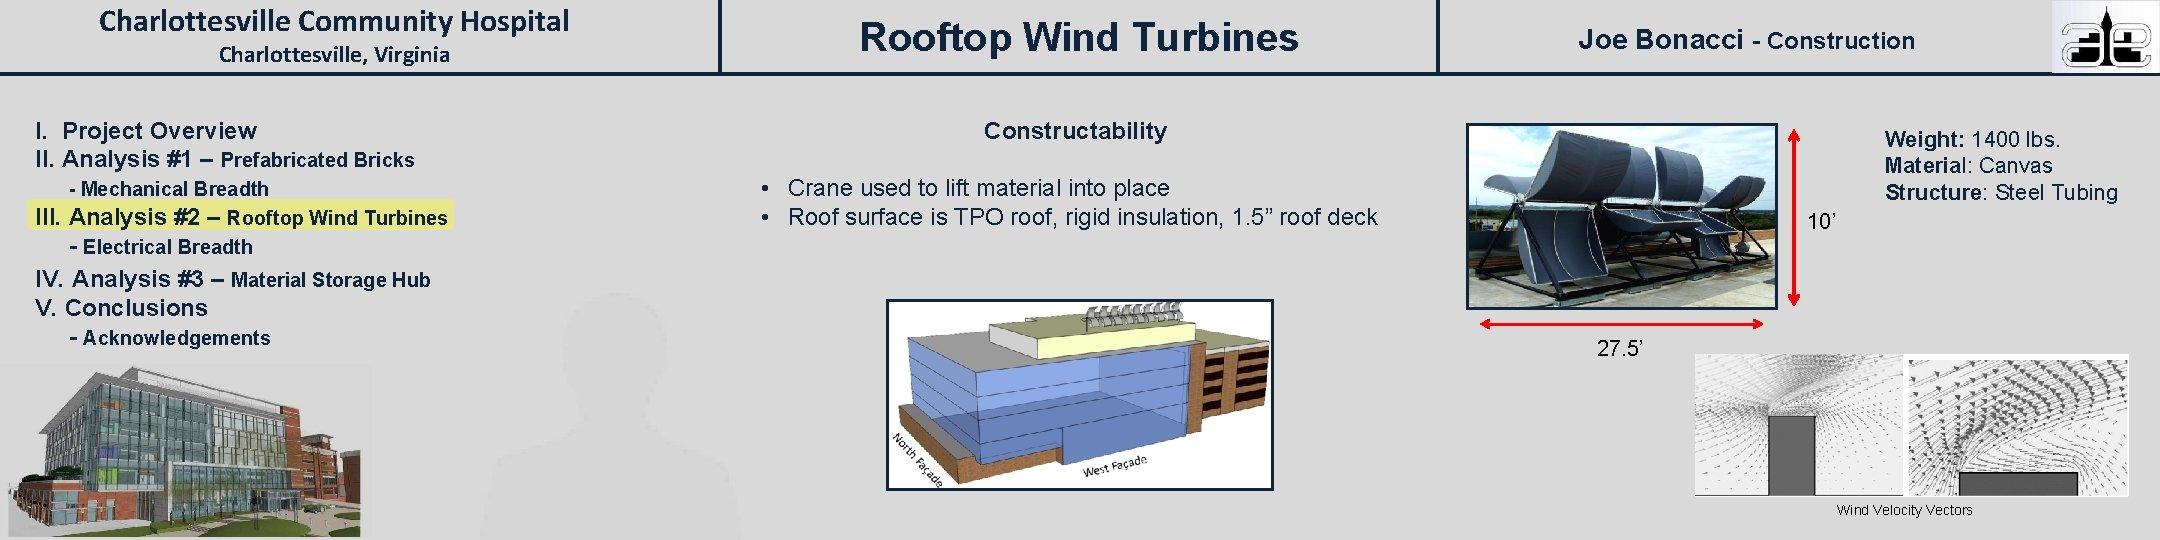 Charlottesville Community Hospital Rooftop Wind Turbines Charlottesville, Virginia I. Project Overview II. Analysis #1